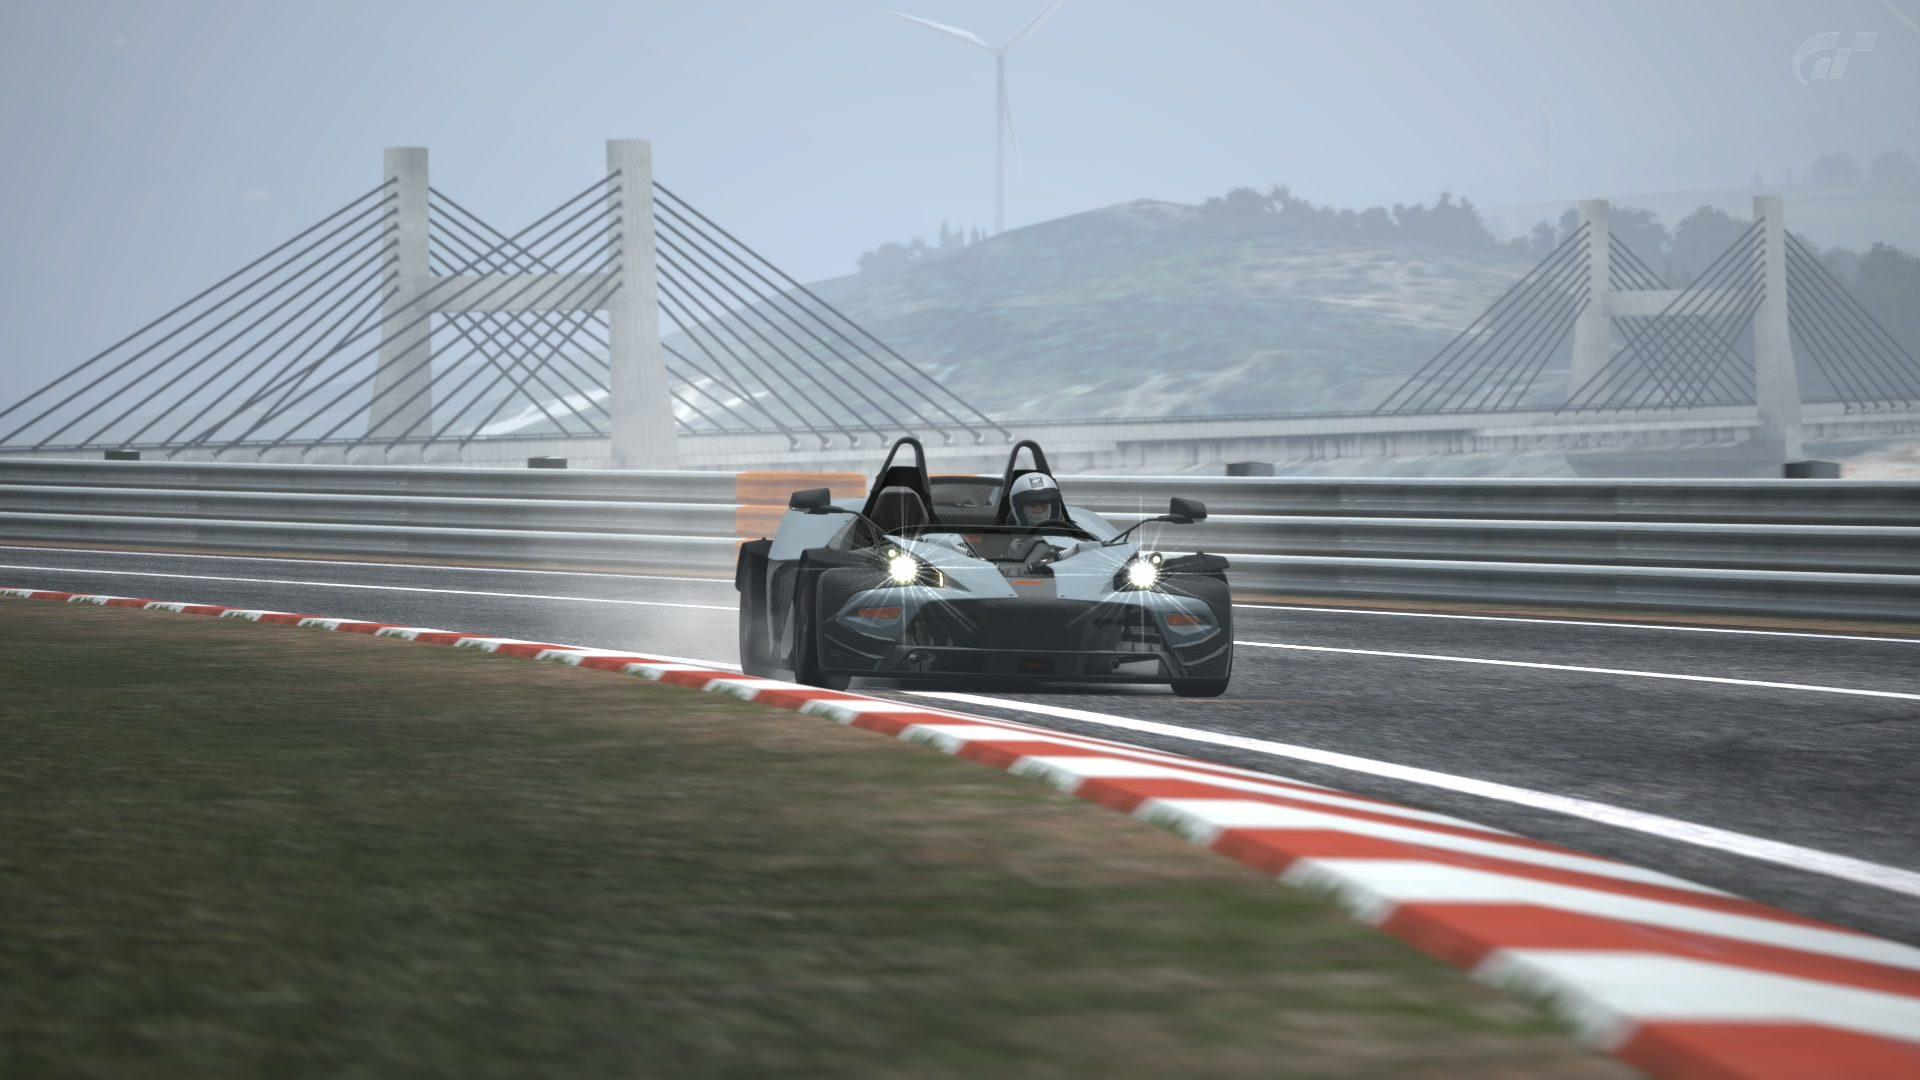 Circuito de la Sierra - X-Bow wet day 13.jpg